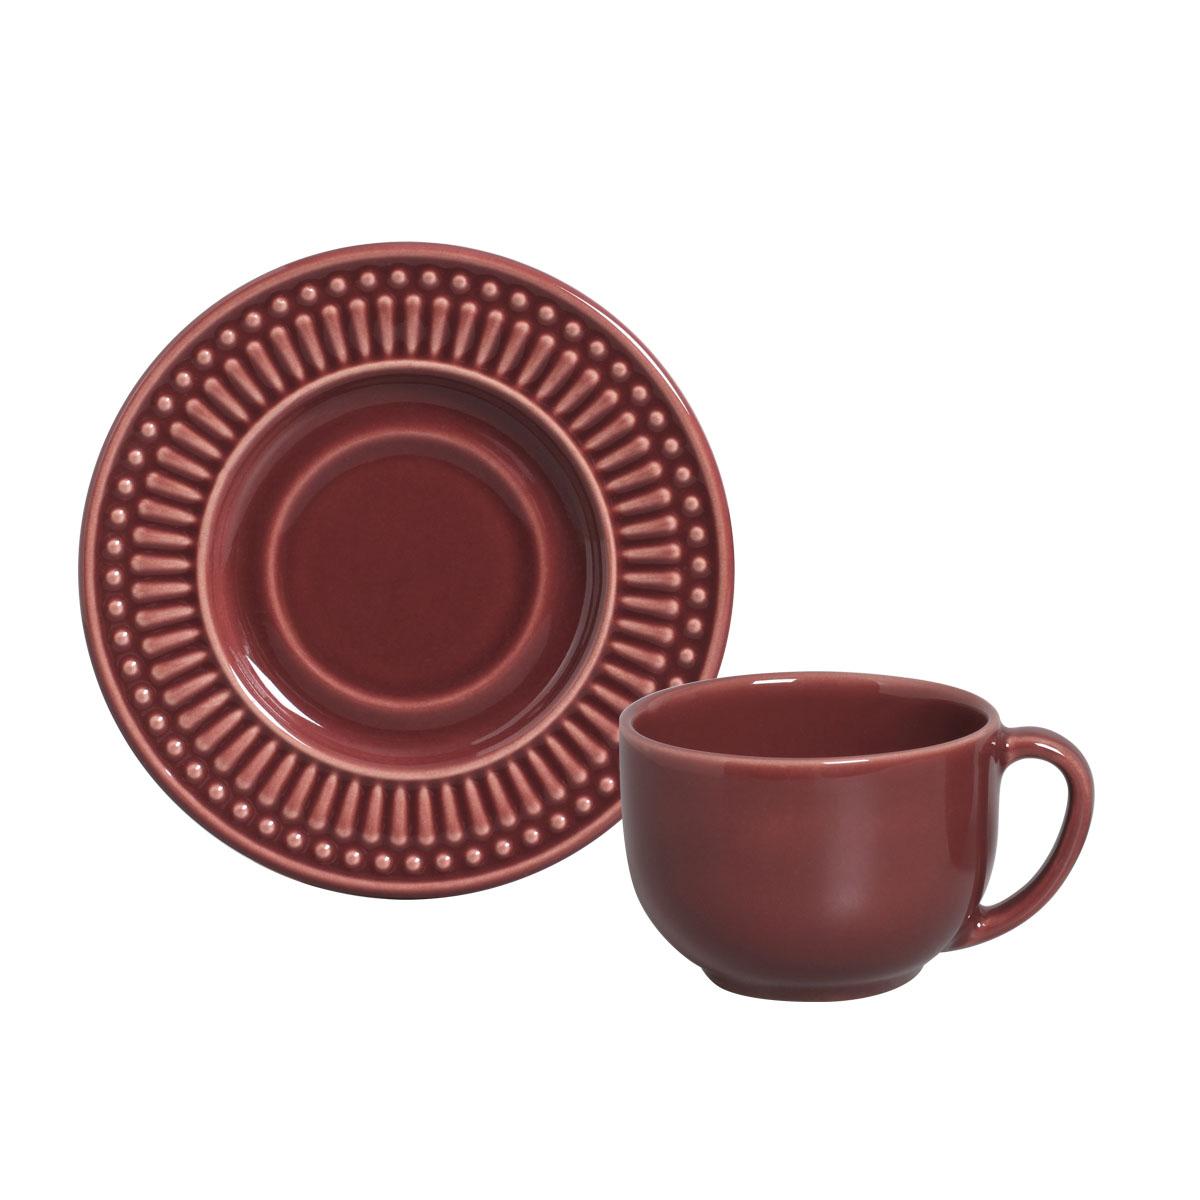 Xícara Chá com Pires 01 Peça Roma Cassis 161 ml Porto Brasil